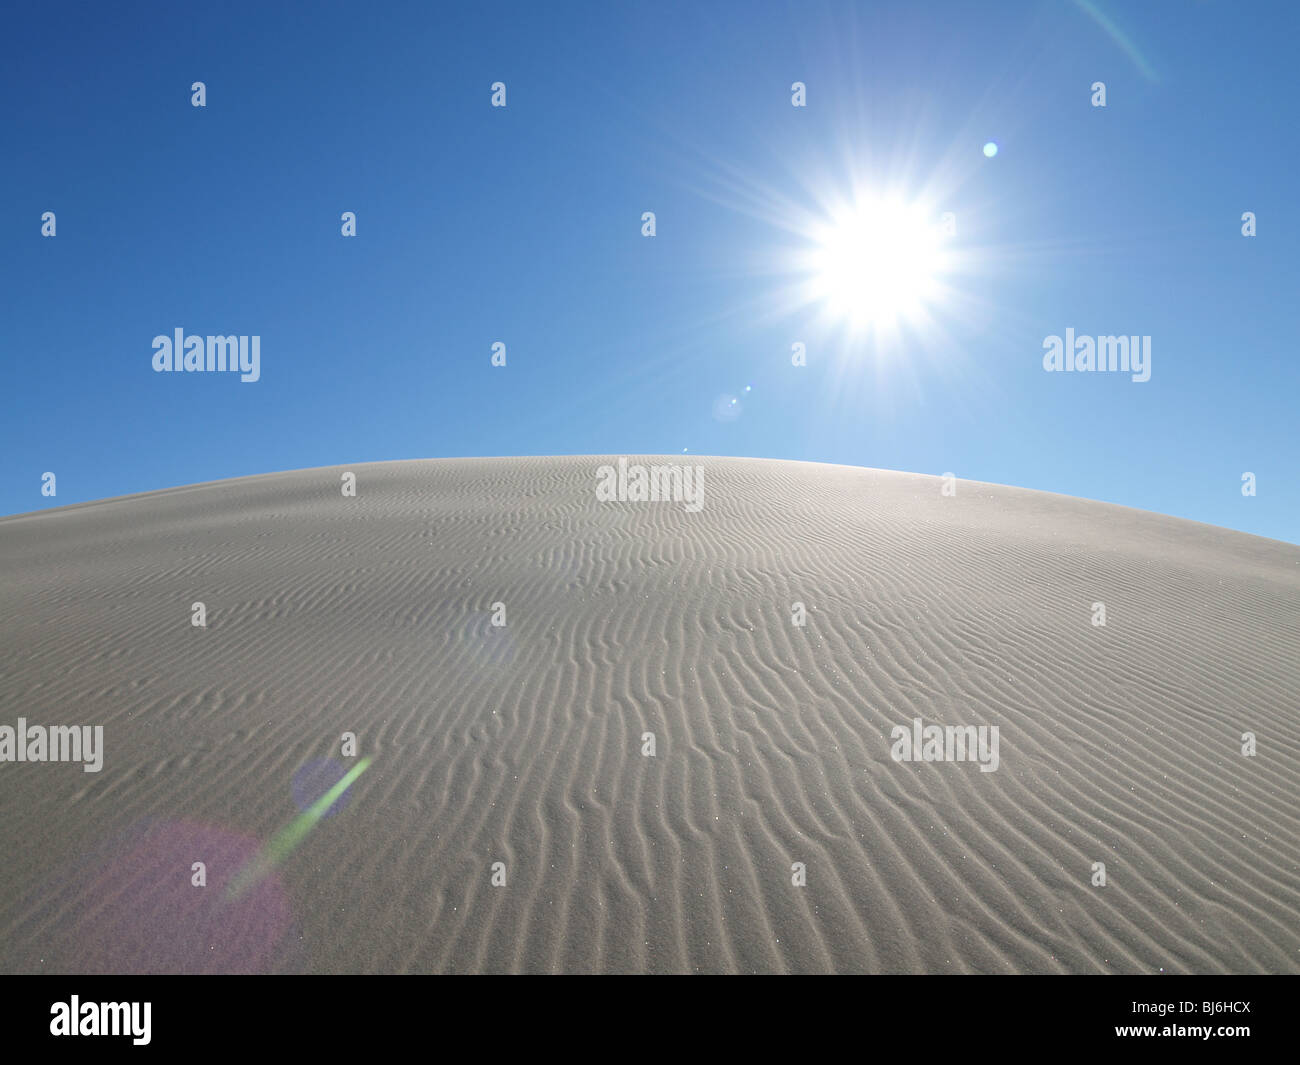 Blazing sun at Dumont Dunes in the California Mojave Desert. - Stock Image